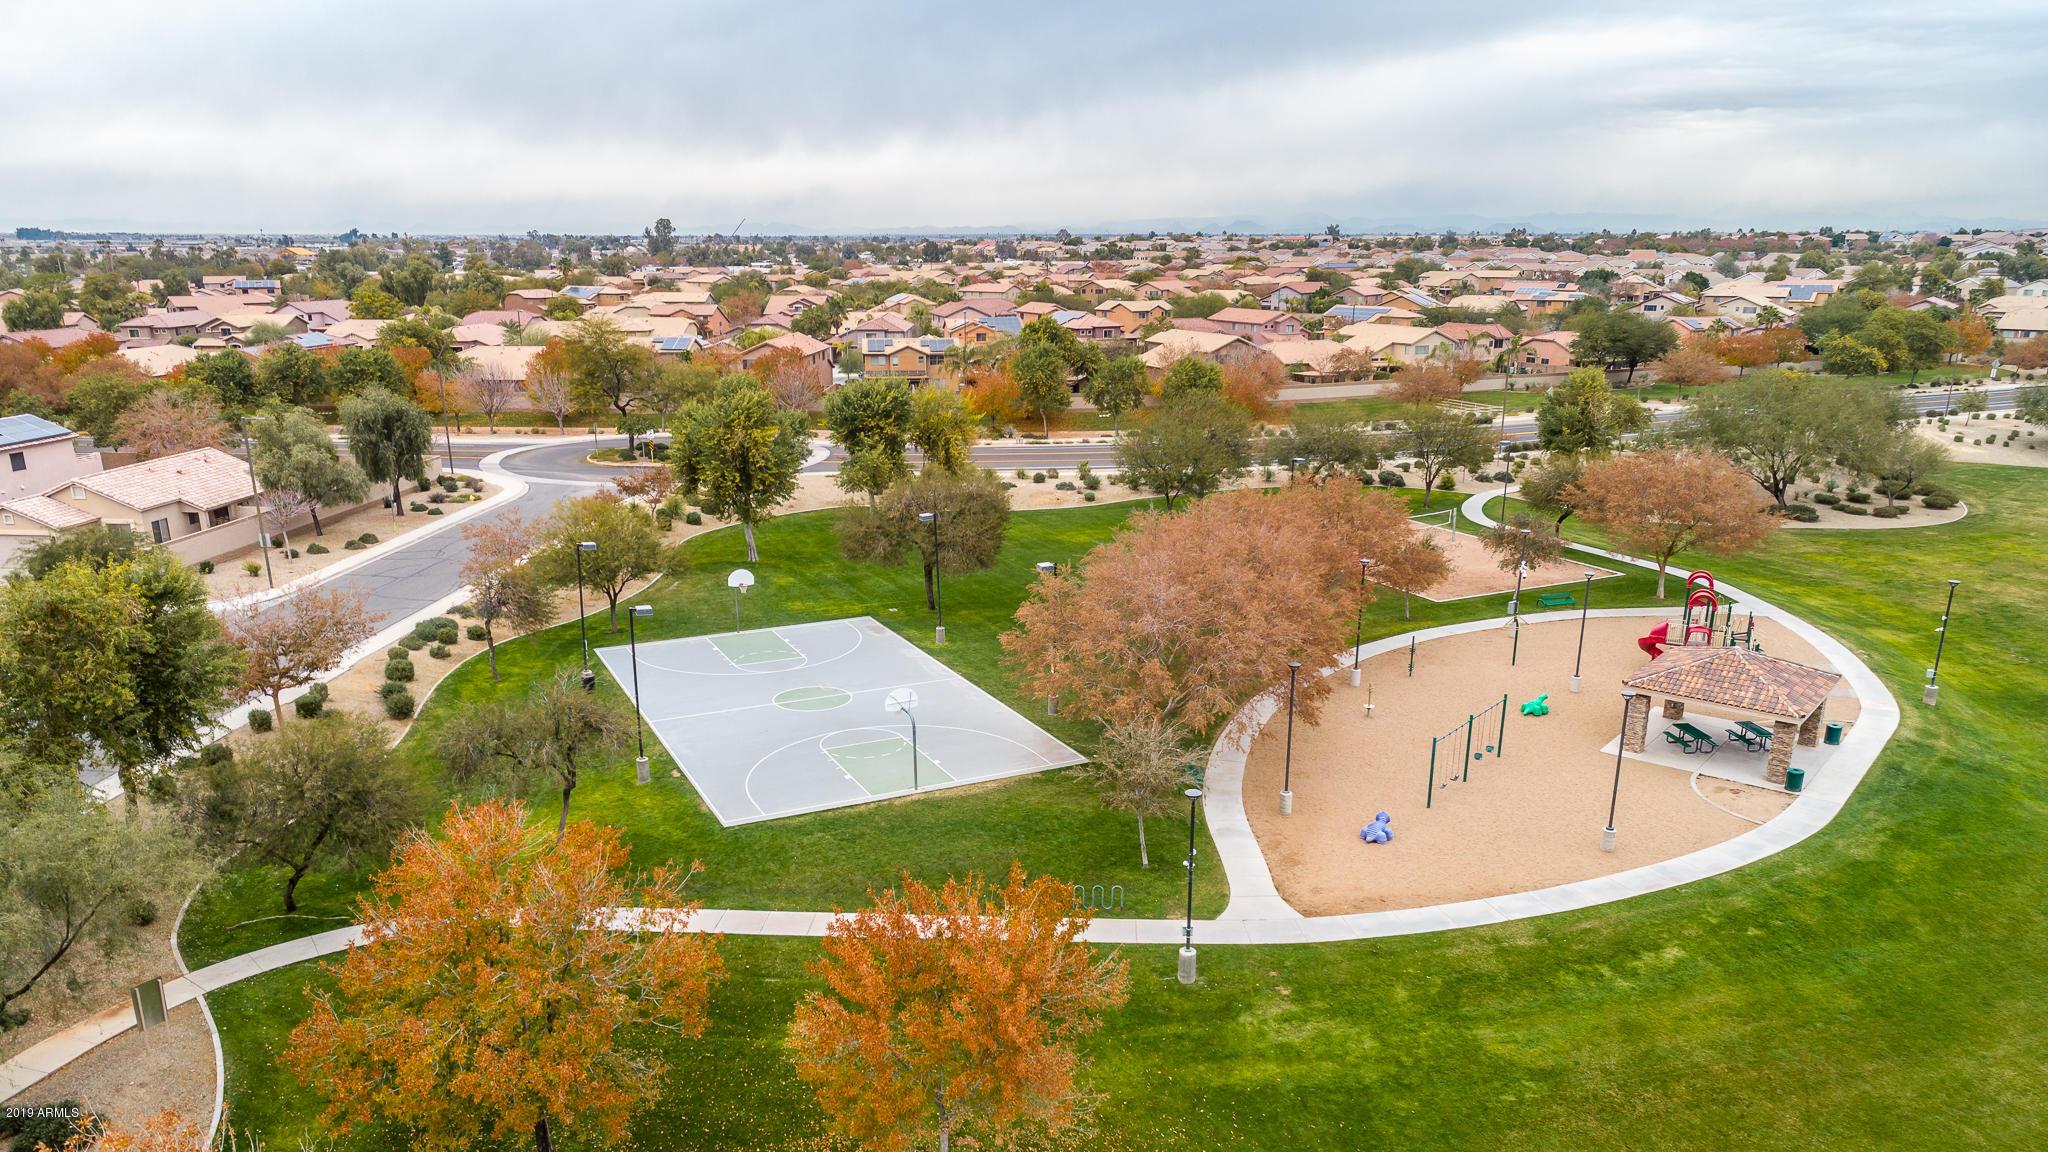 MLS 5862625 13641 W SOLANO Drive, Litchfield Park, AZ 85340 Litchfield Park AZ Dreaming Summit